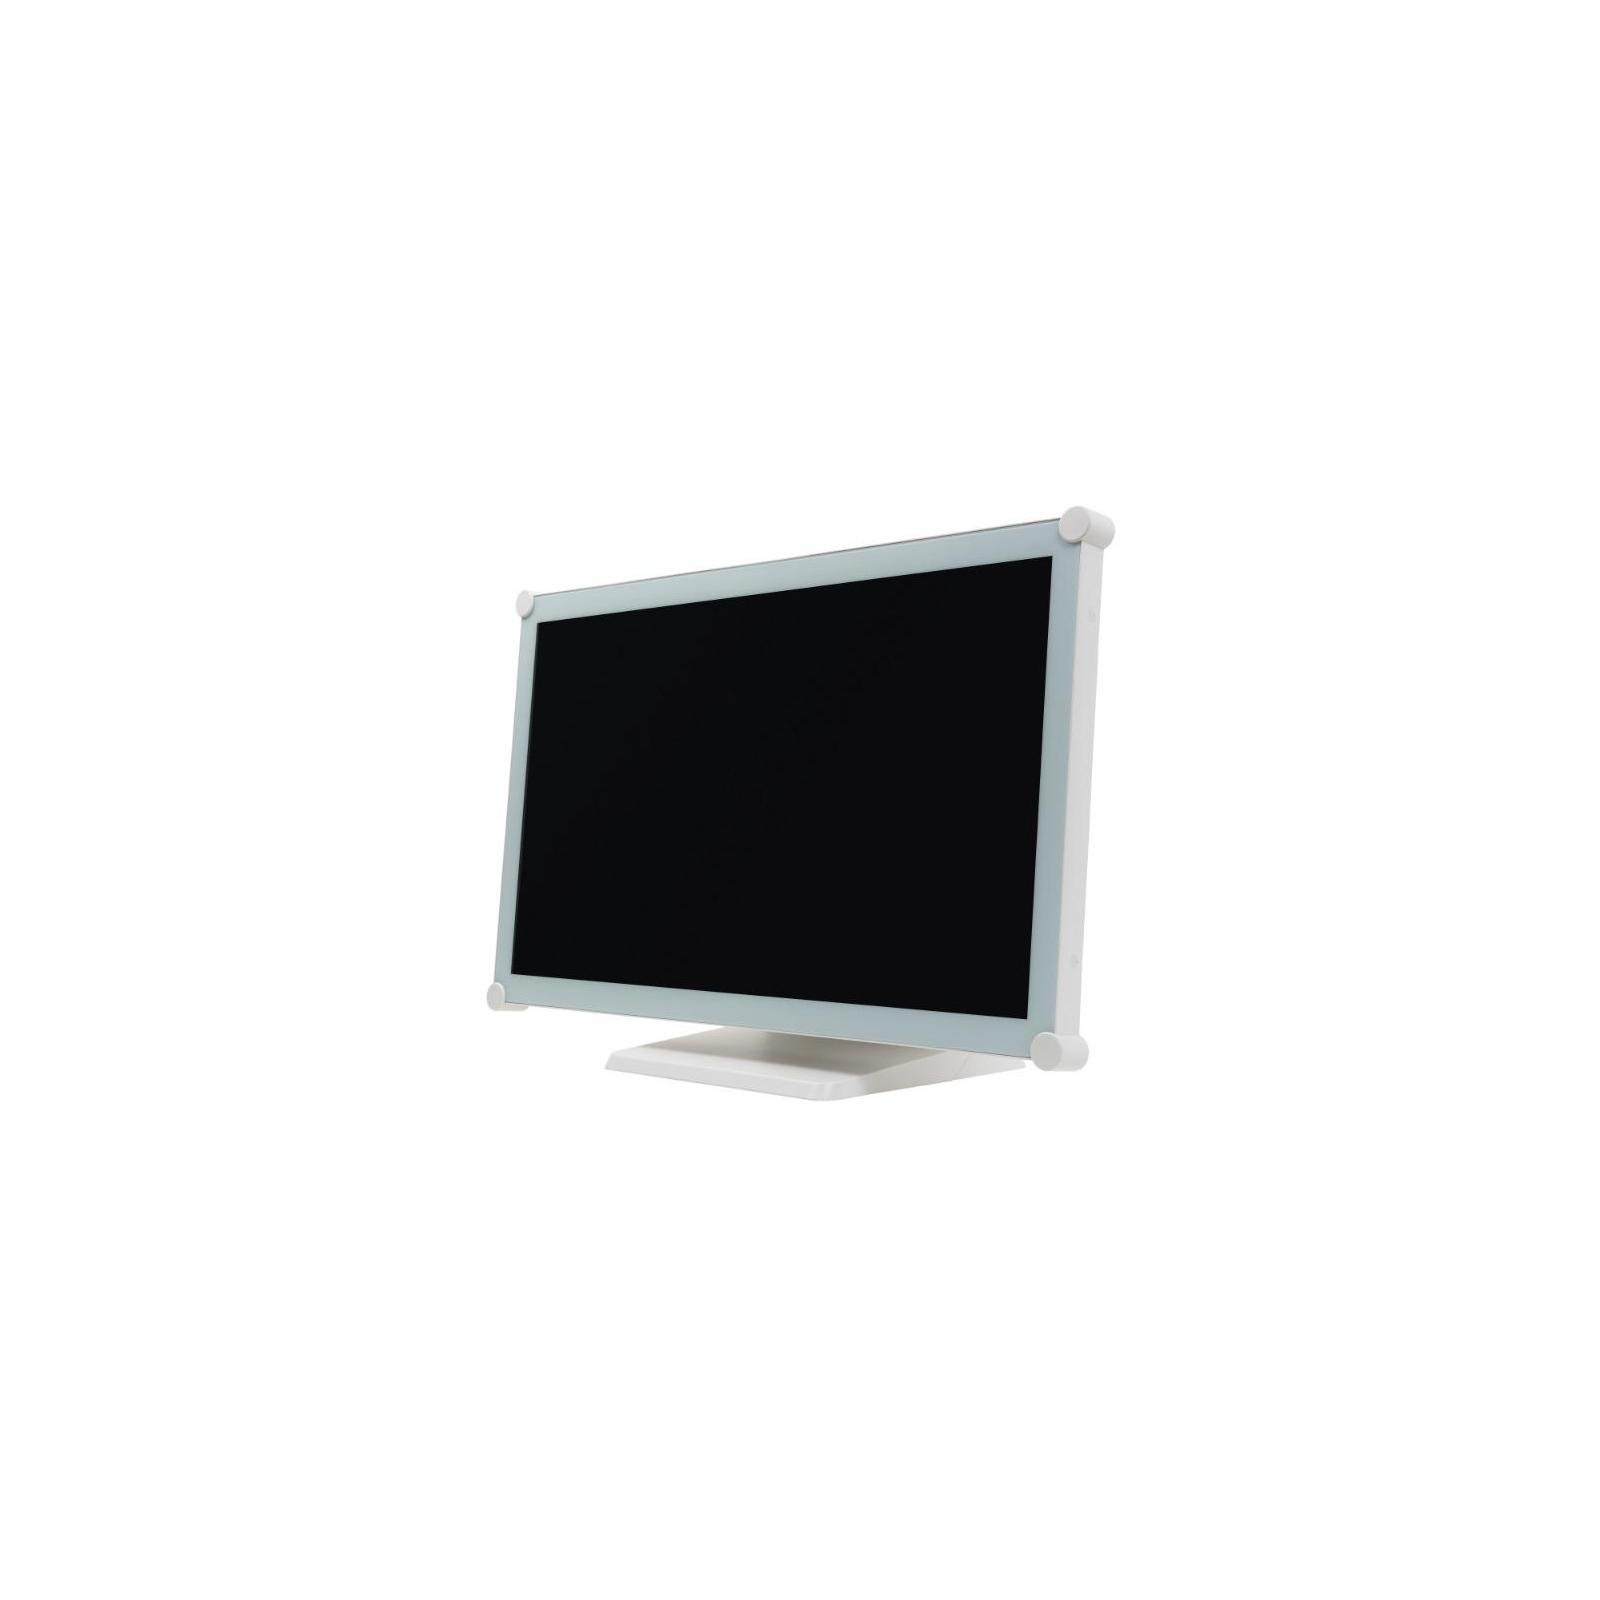 Монитор Neovo TX-22 WHITE изображение 2